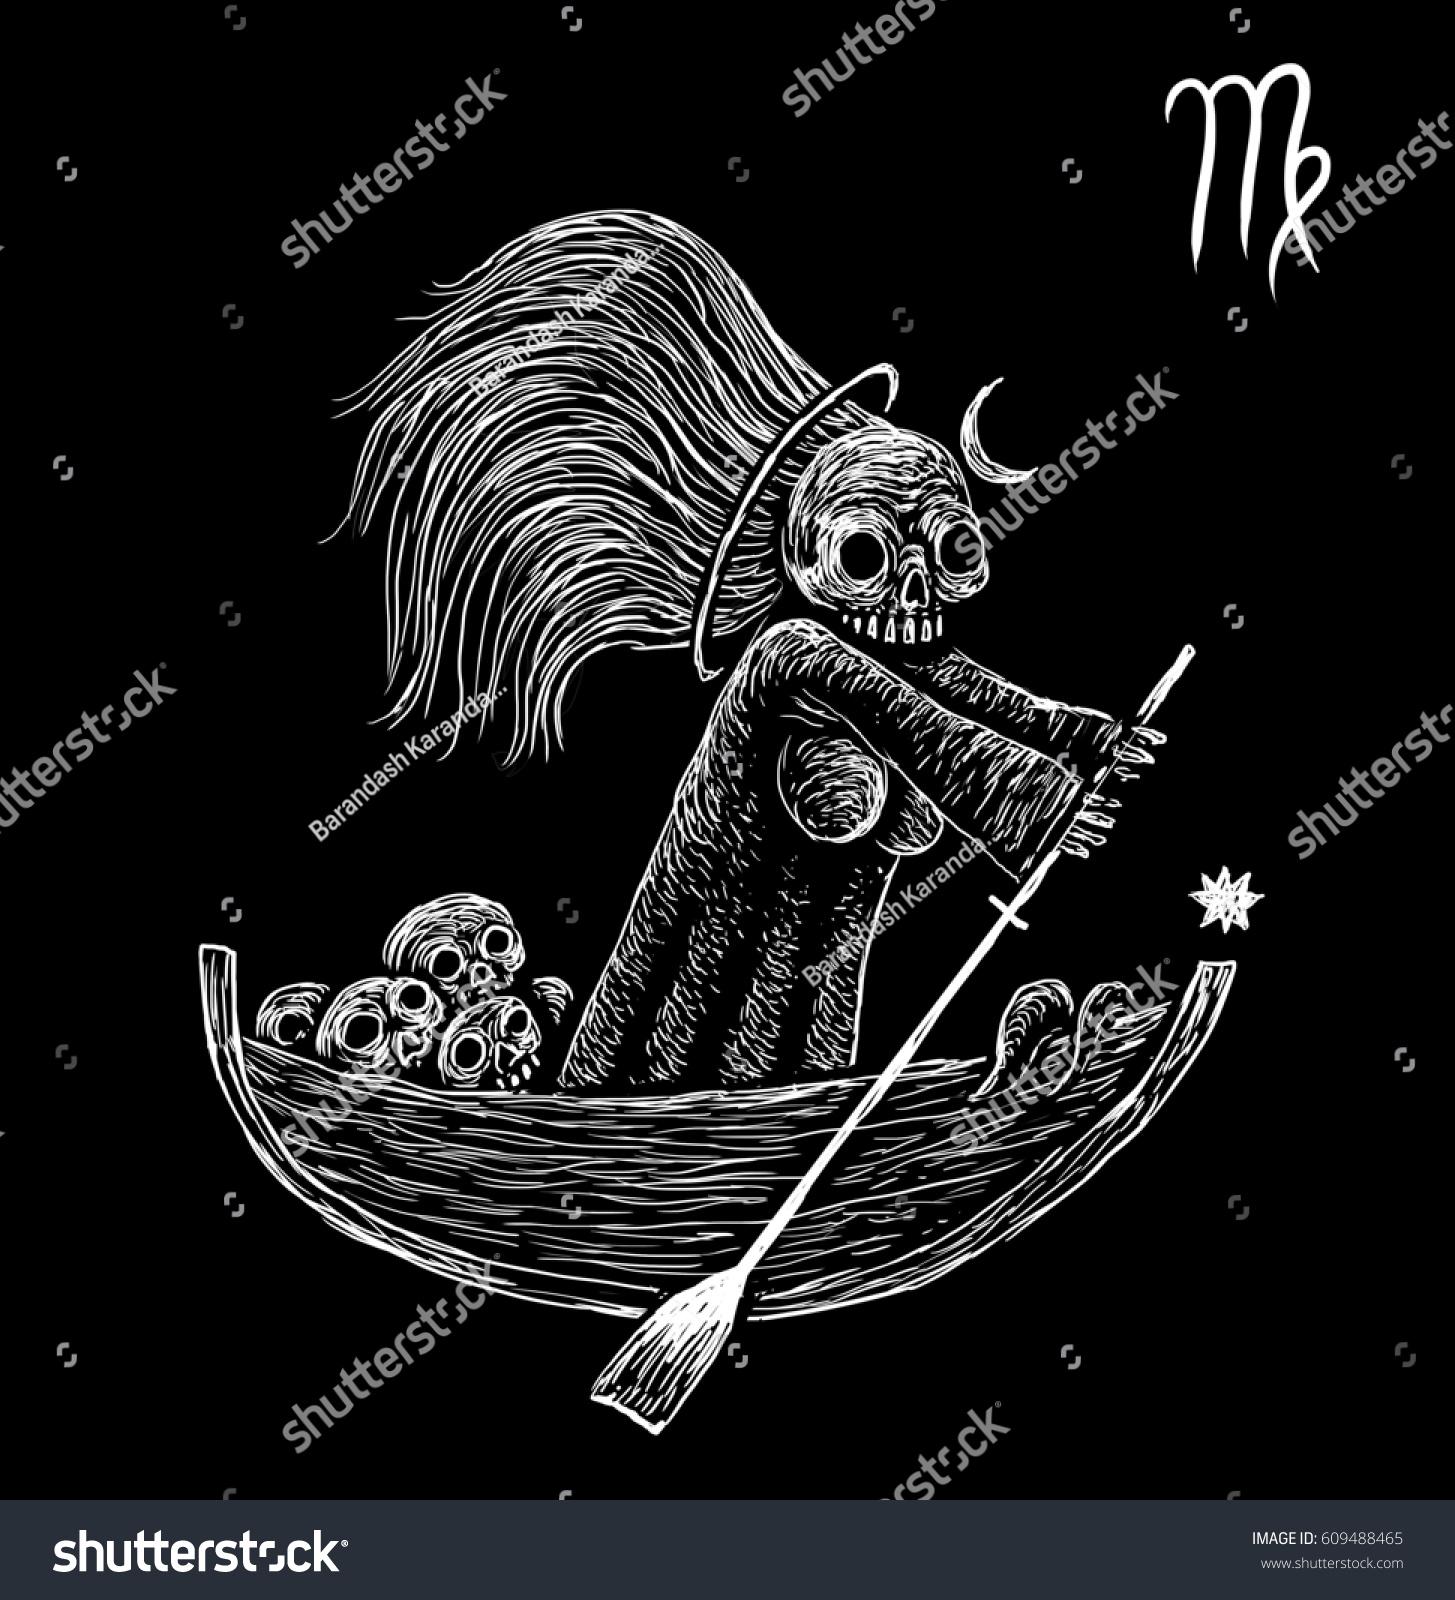 Viking horoscope 16